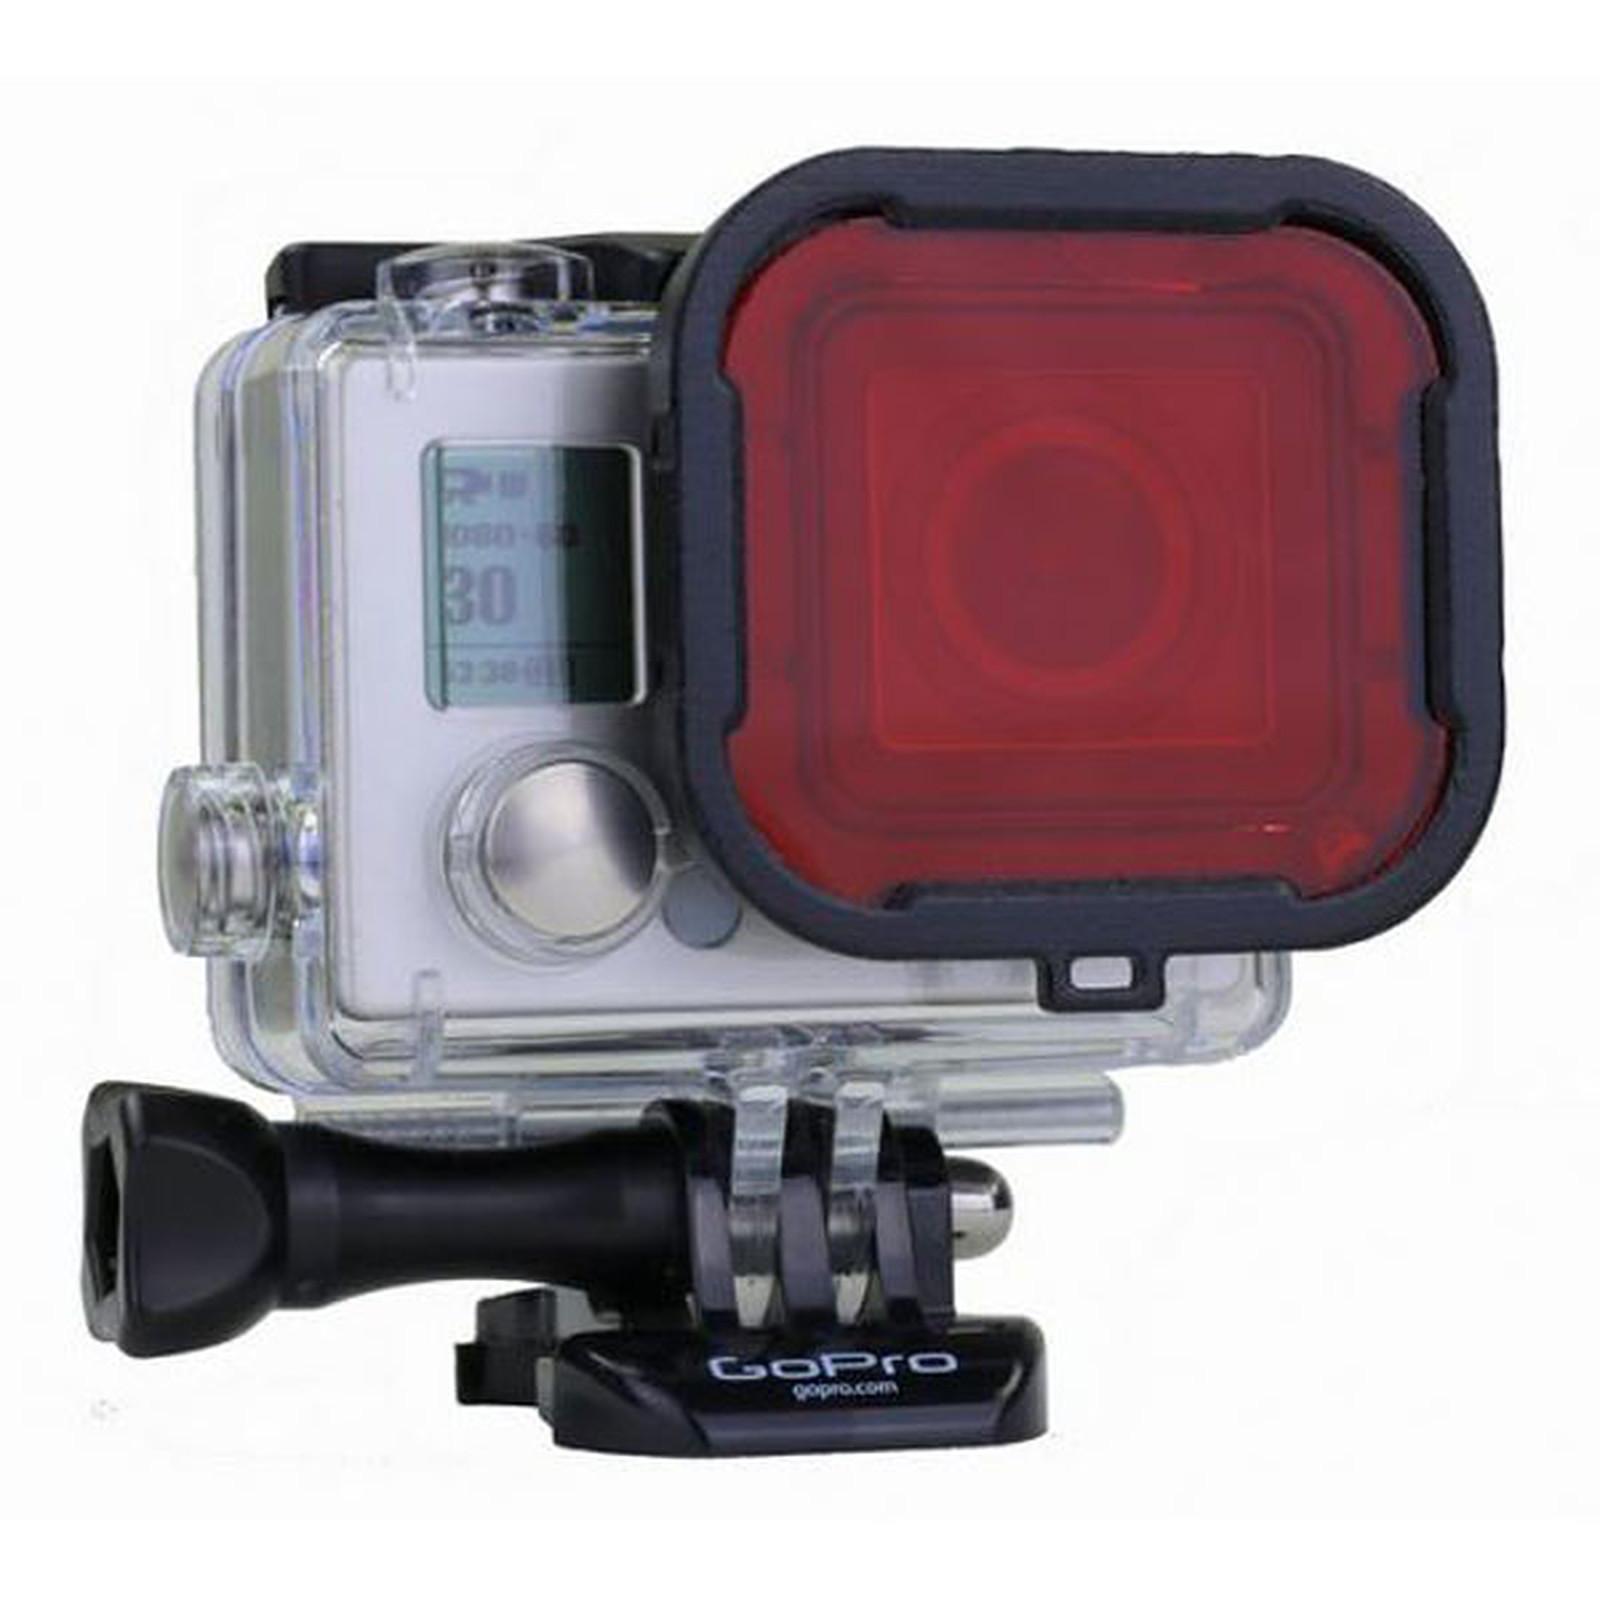 Polar Pro Glass Filtre Blue & Tropical Water Hero3+